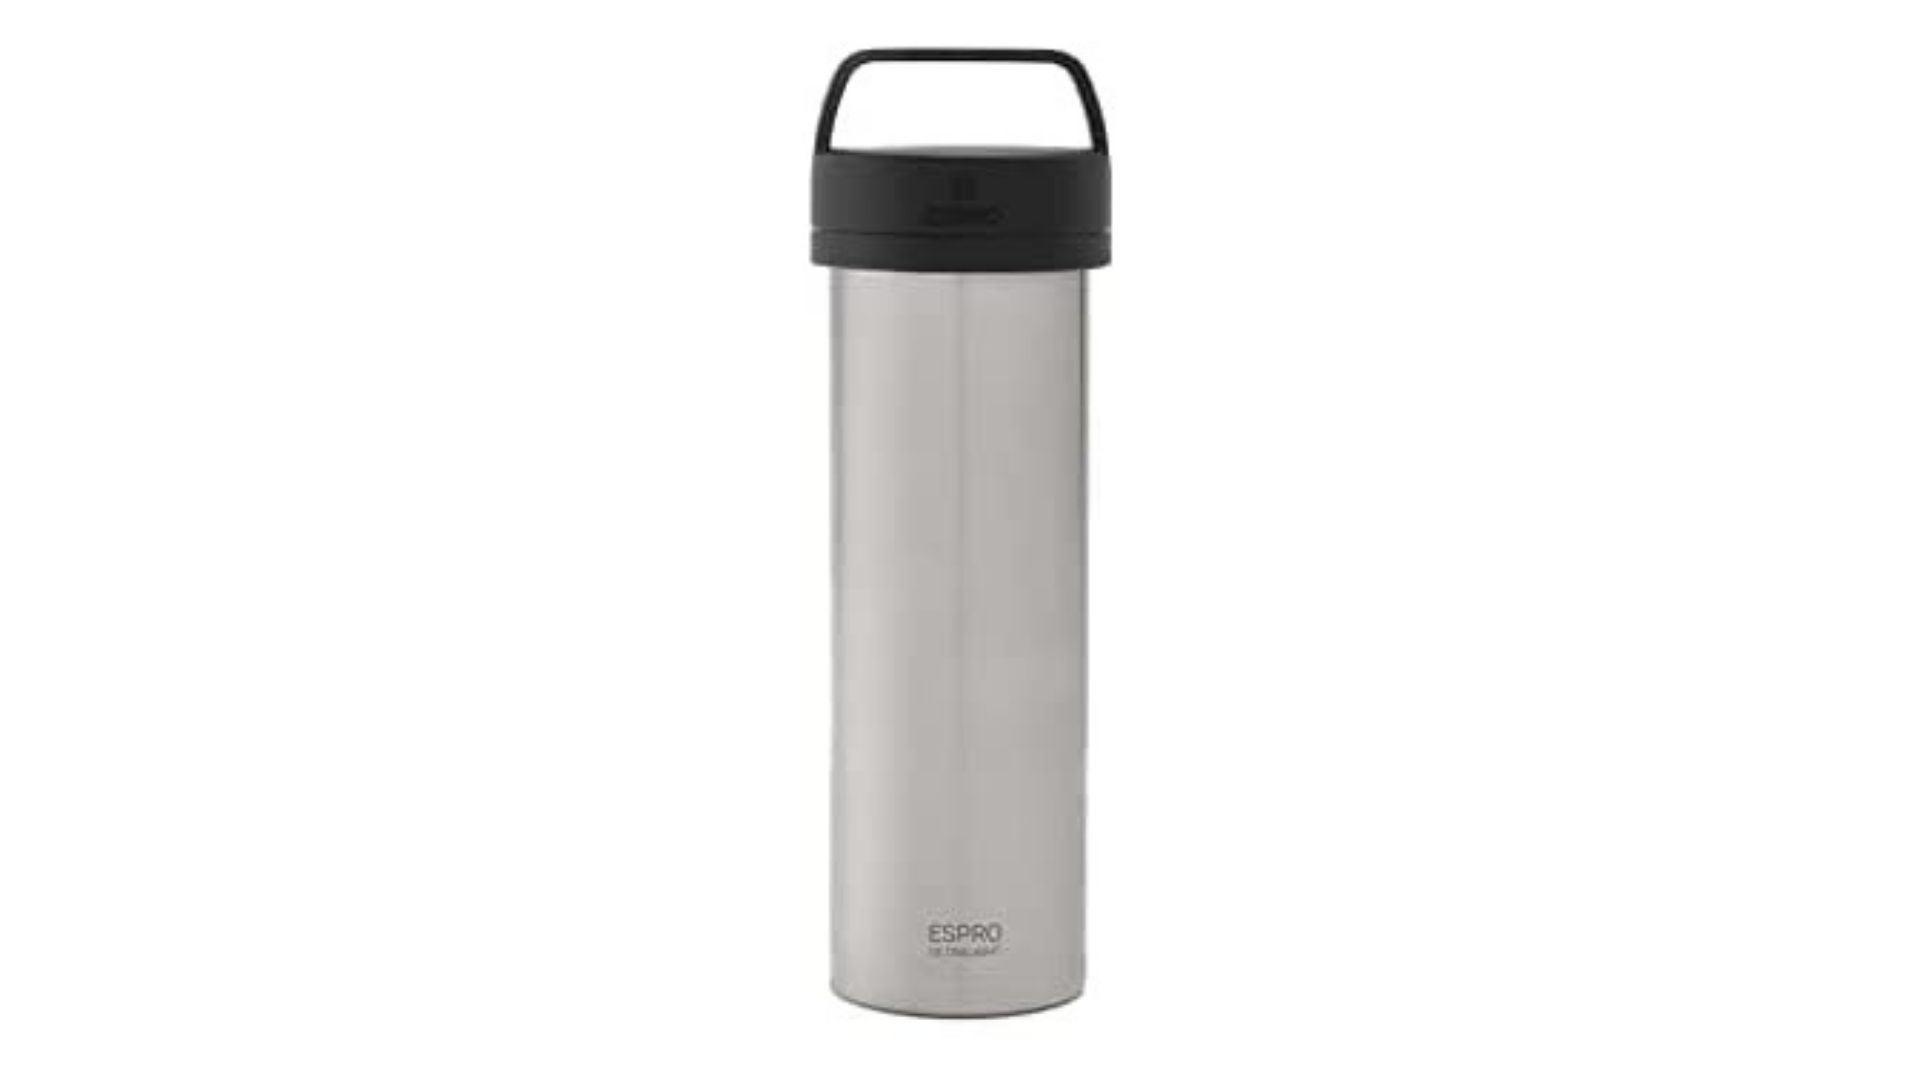 ESPRO P0 Ultralight Coffee Press